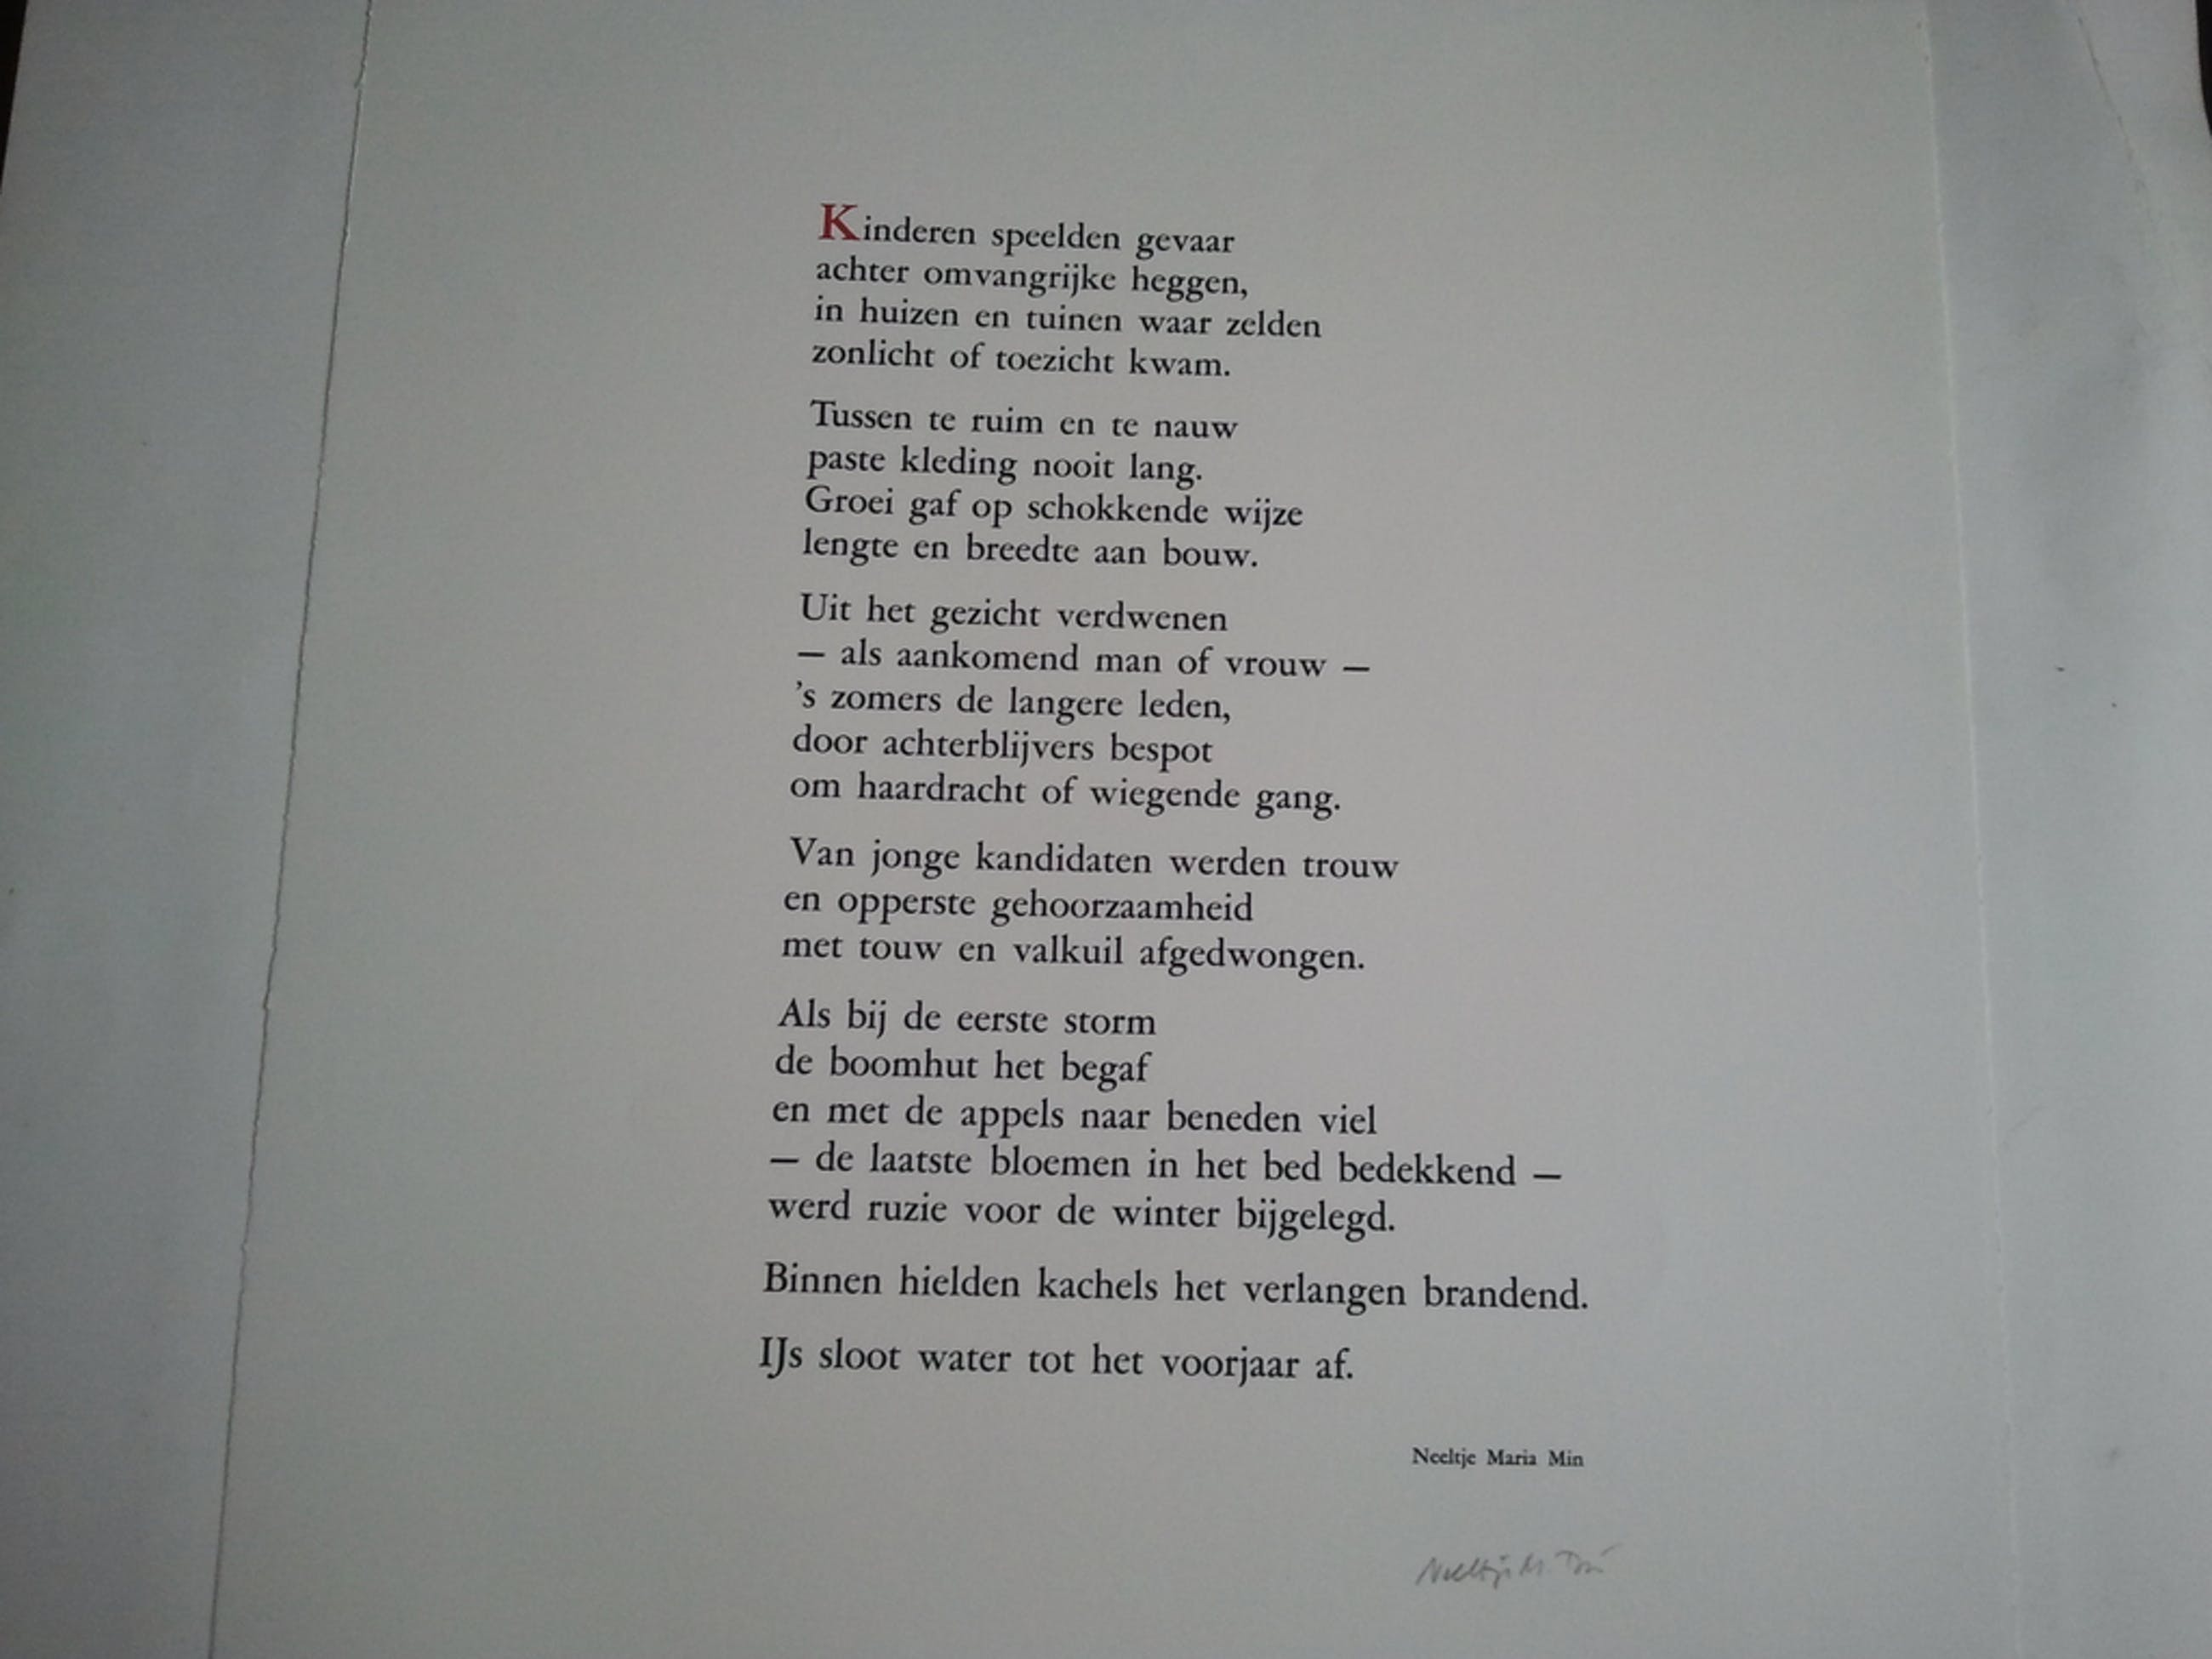 Neeltje Maria Min Gedicht Gesign Verkocht Bekijk De